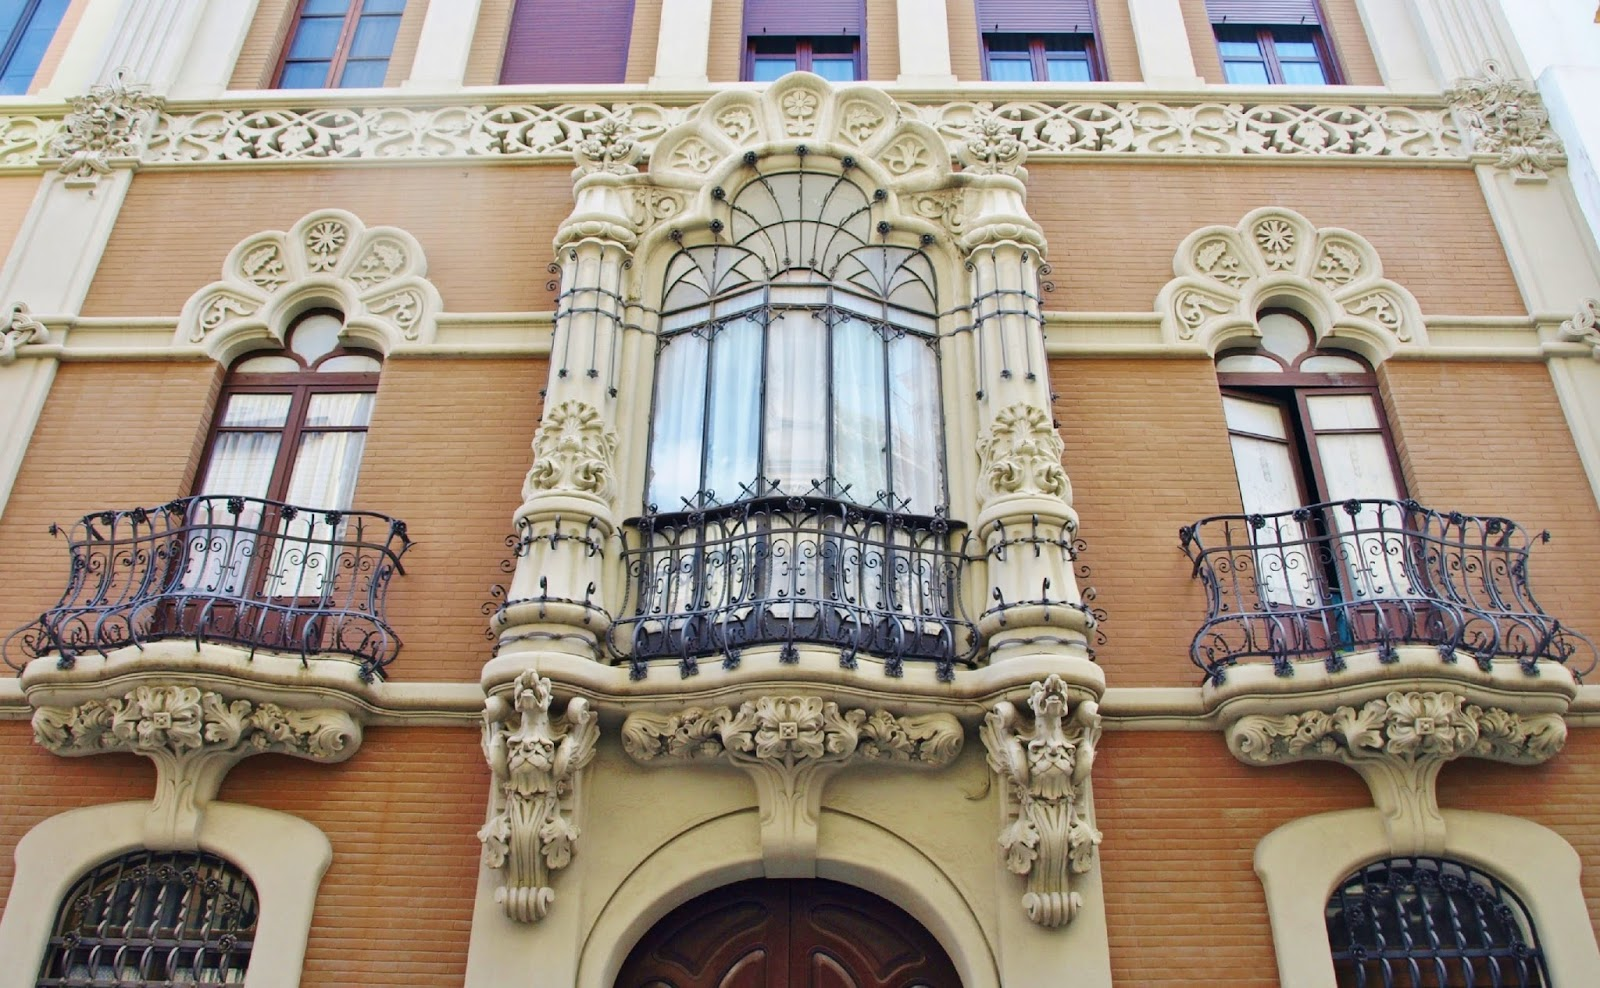 Sevilla daily photo 1 08 13 1 09 13 - Nouveau sevilla ...